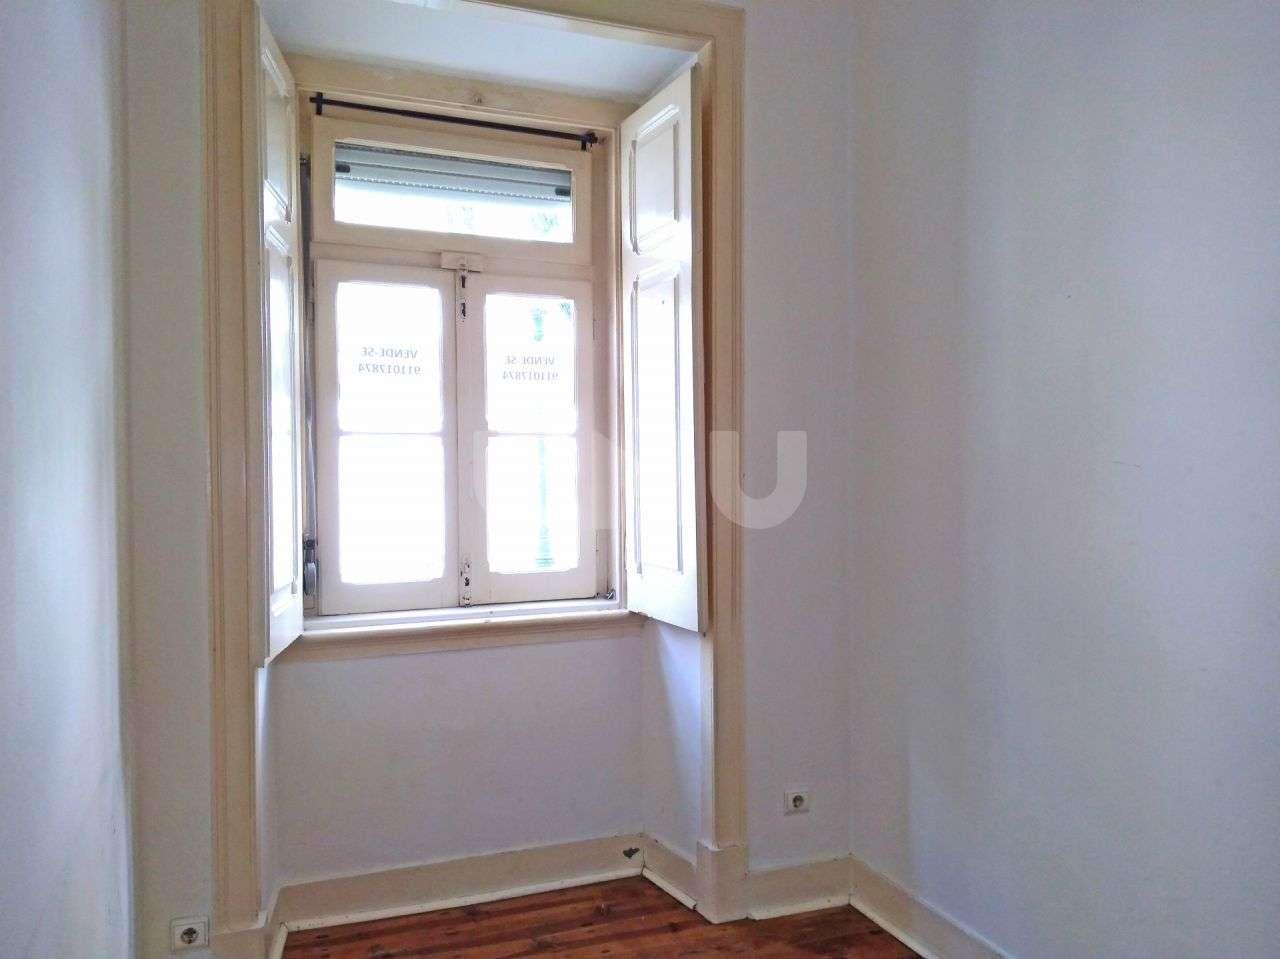 Apartamento para comprar, Arroios, Lisboa - Foto 9